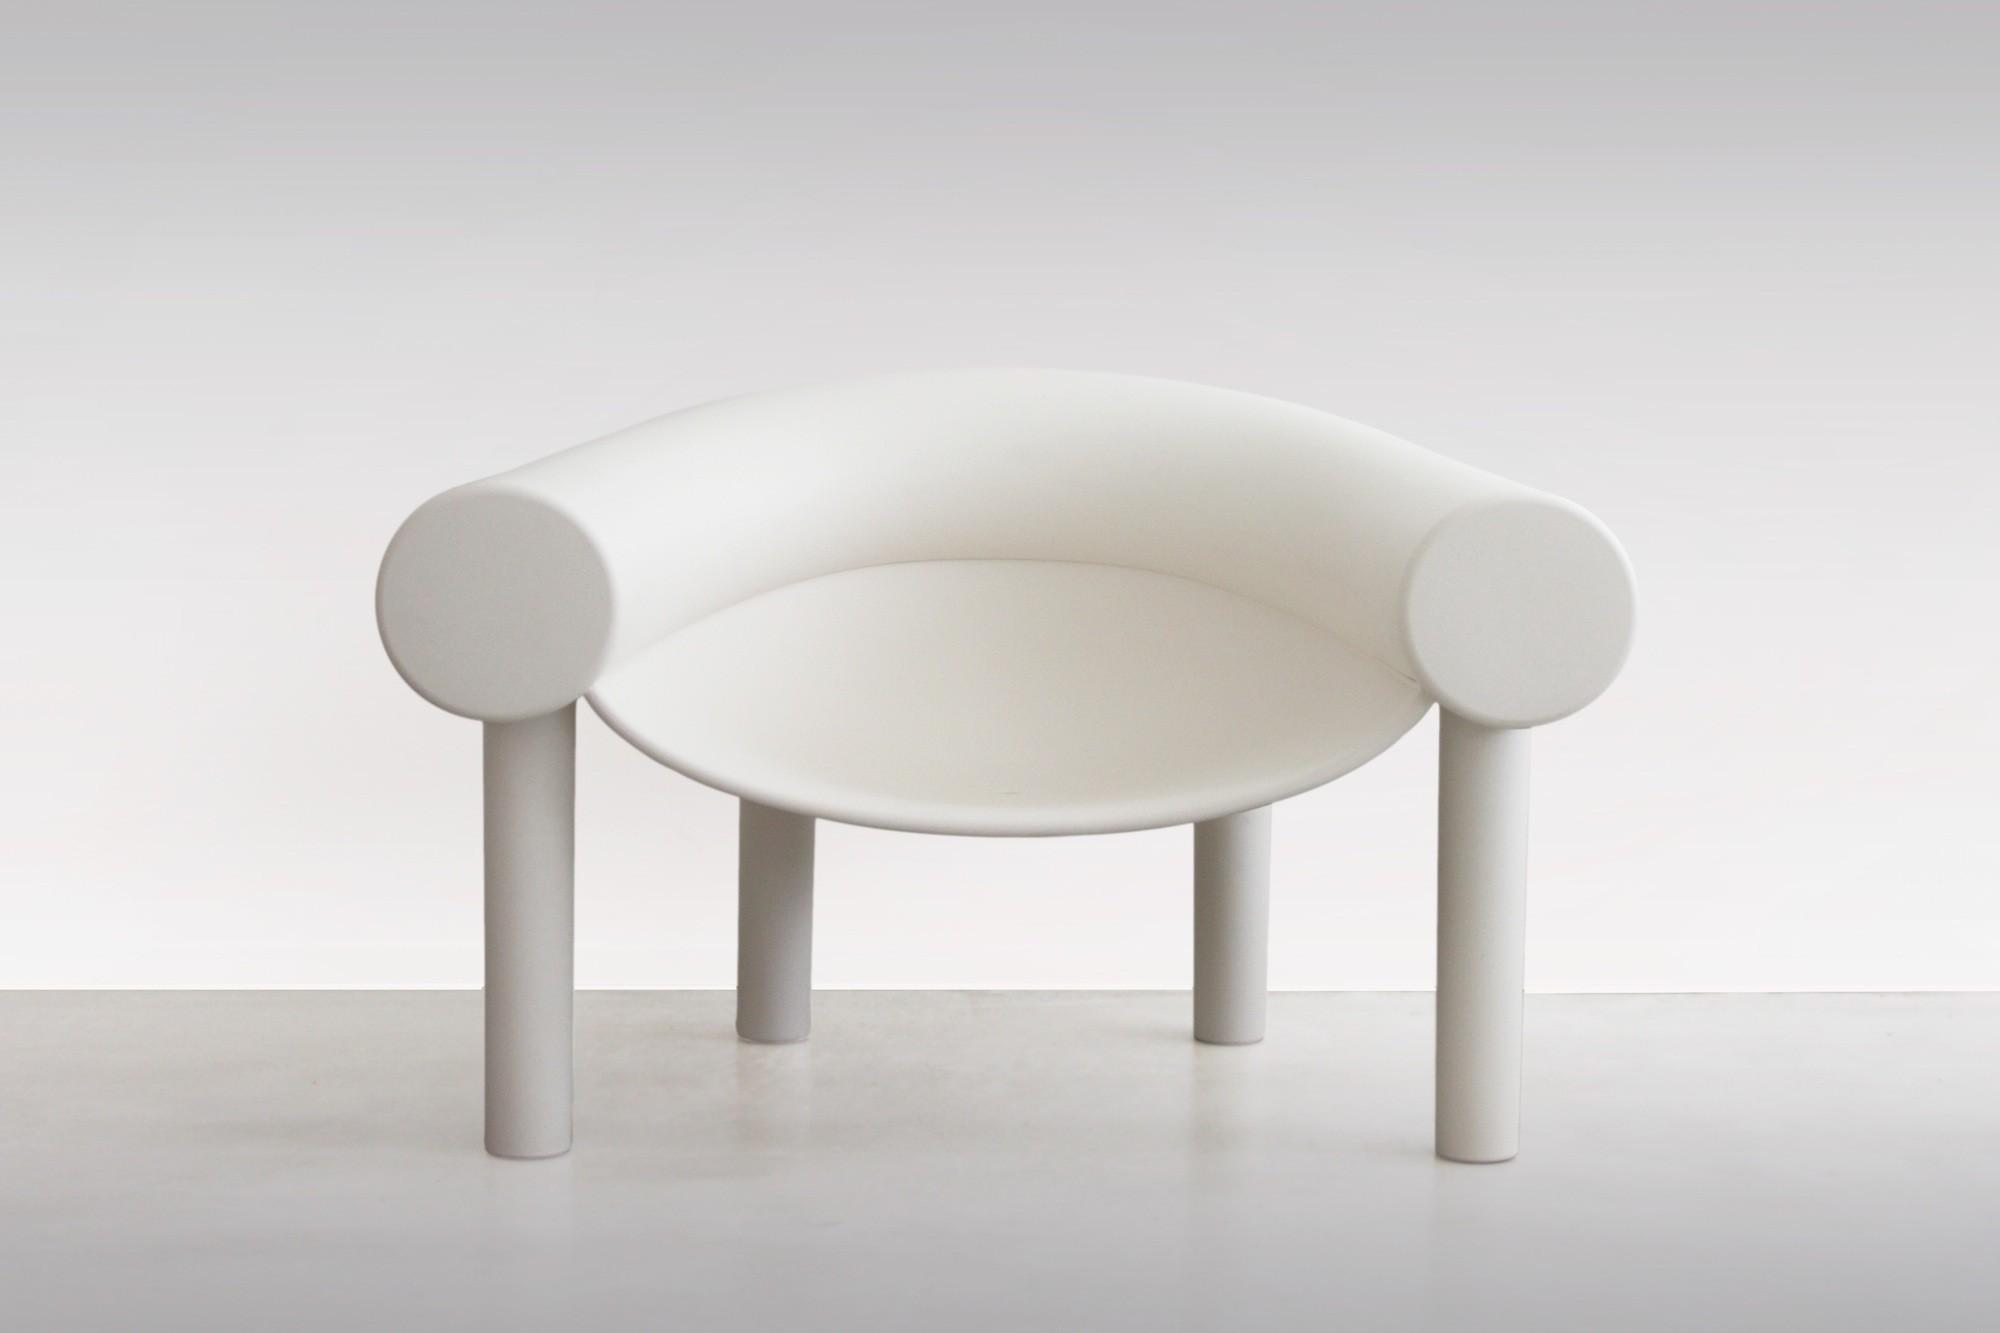 Sam Son Chair By Designer Konstantin Grcic